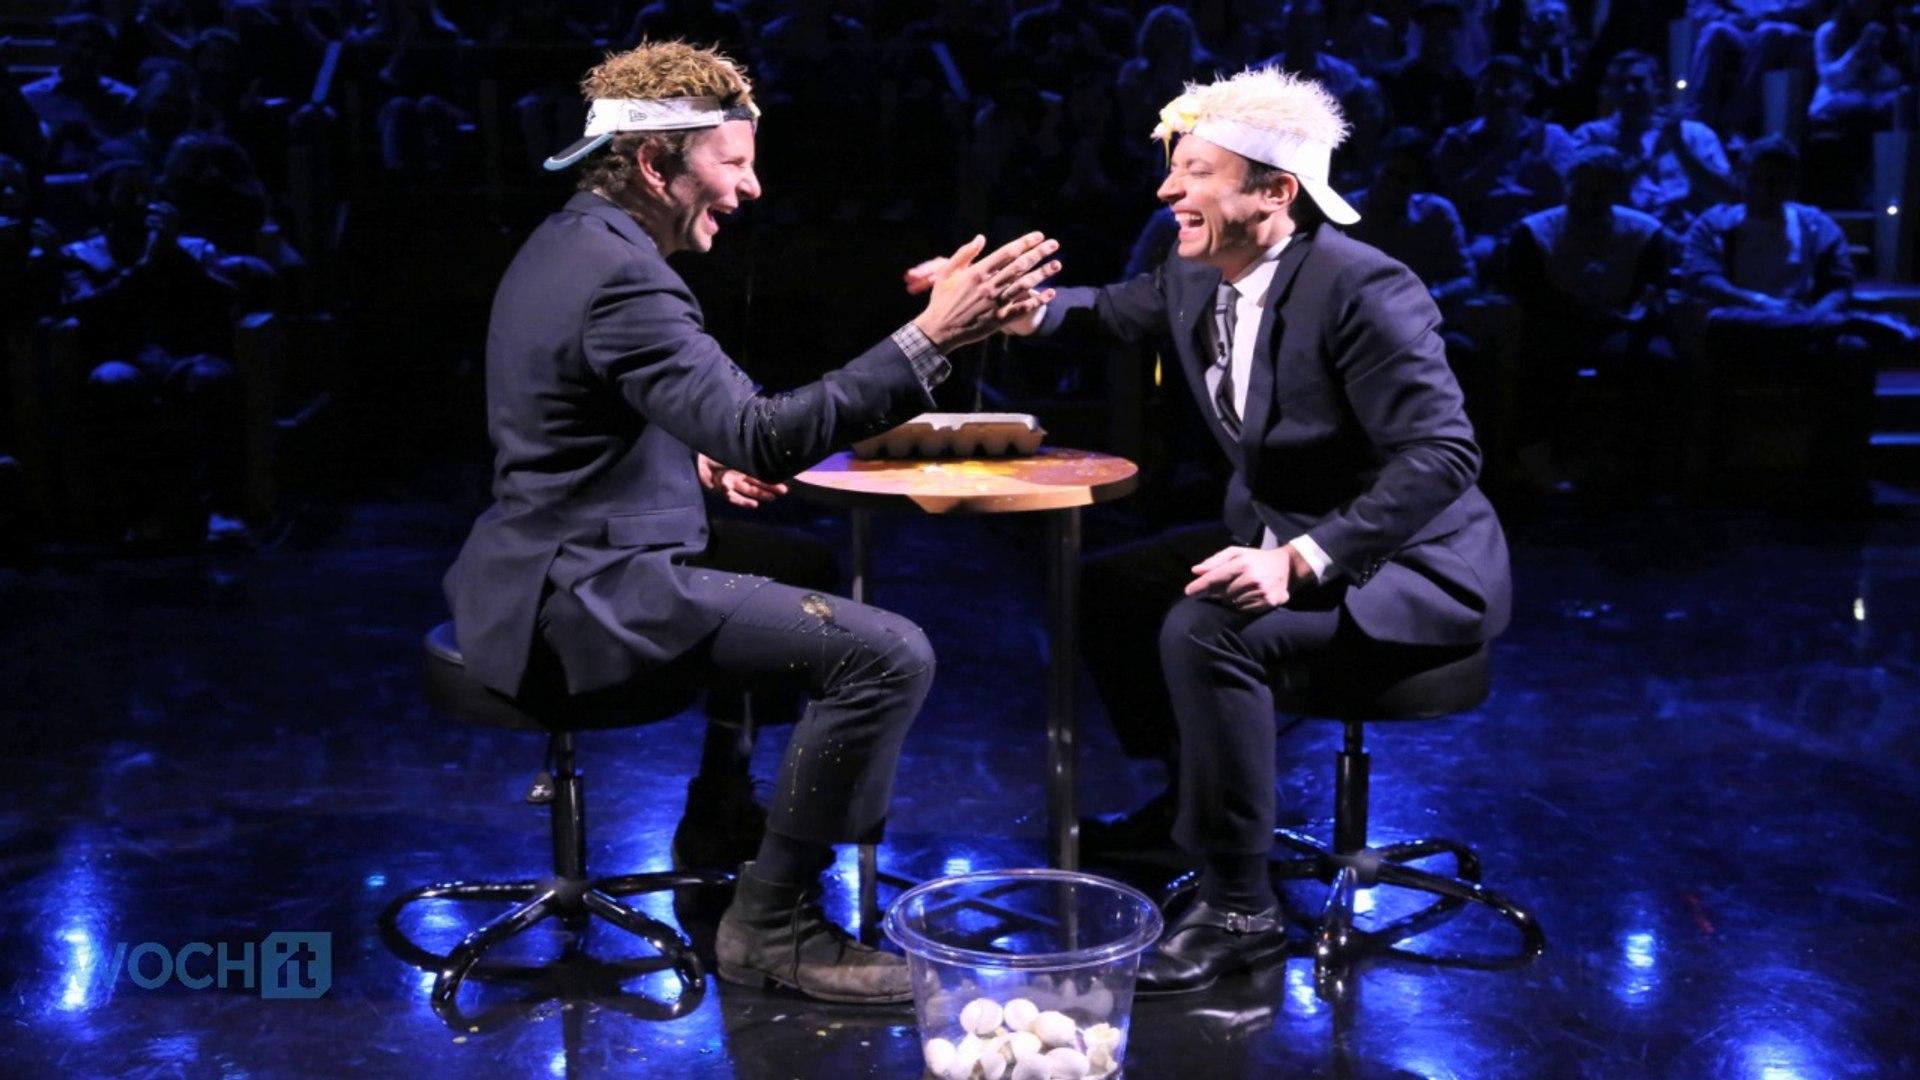 Bradley Cooper Smashing Eggs On His Head Is Jimmy Fallon's